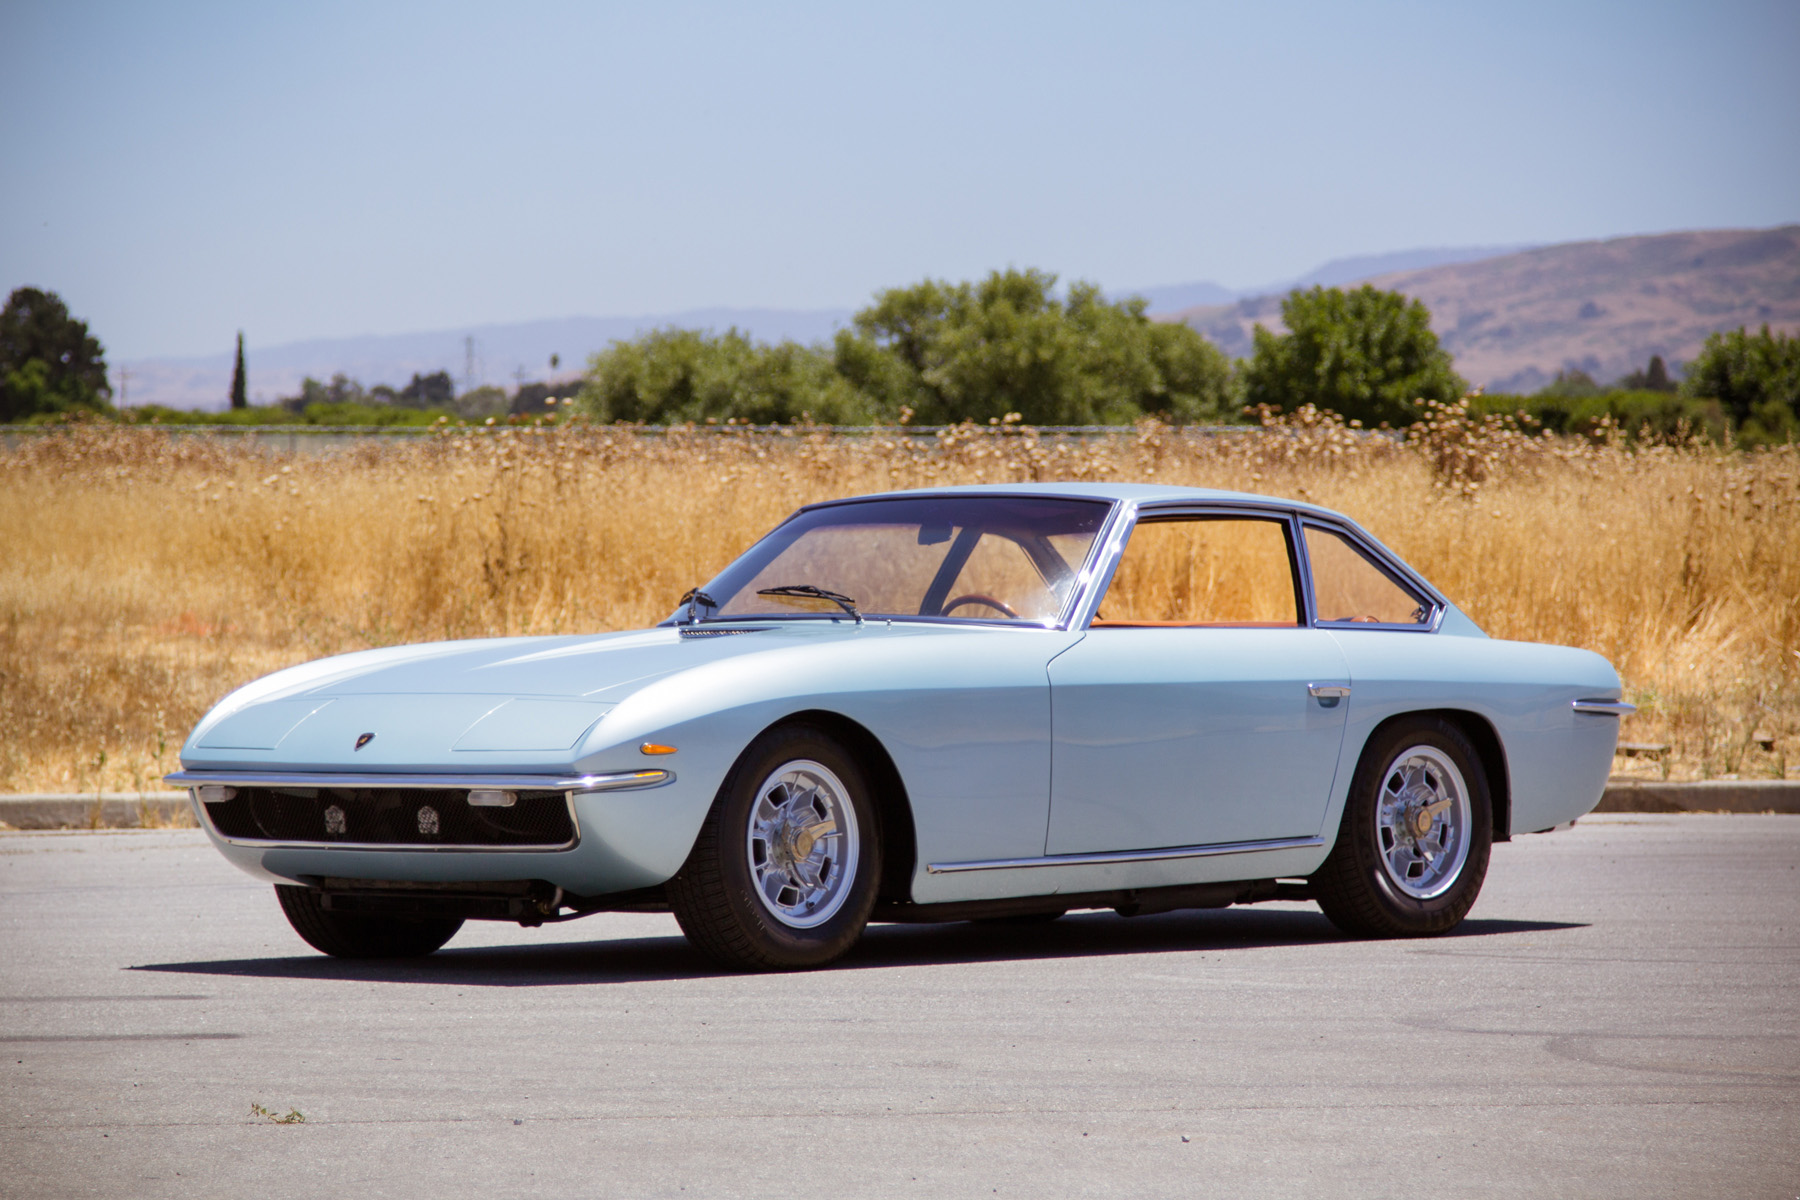 At Gooding & Company, 1968 Lamborghini Islero (Images courtesy of Gooding & Company)